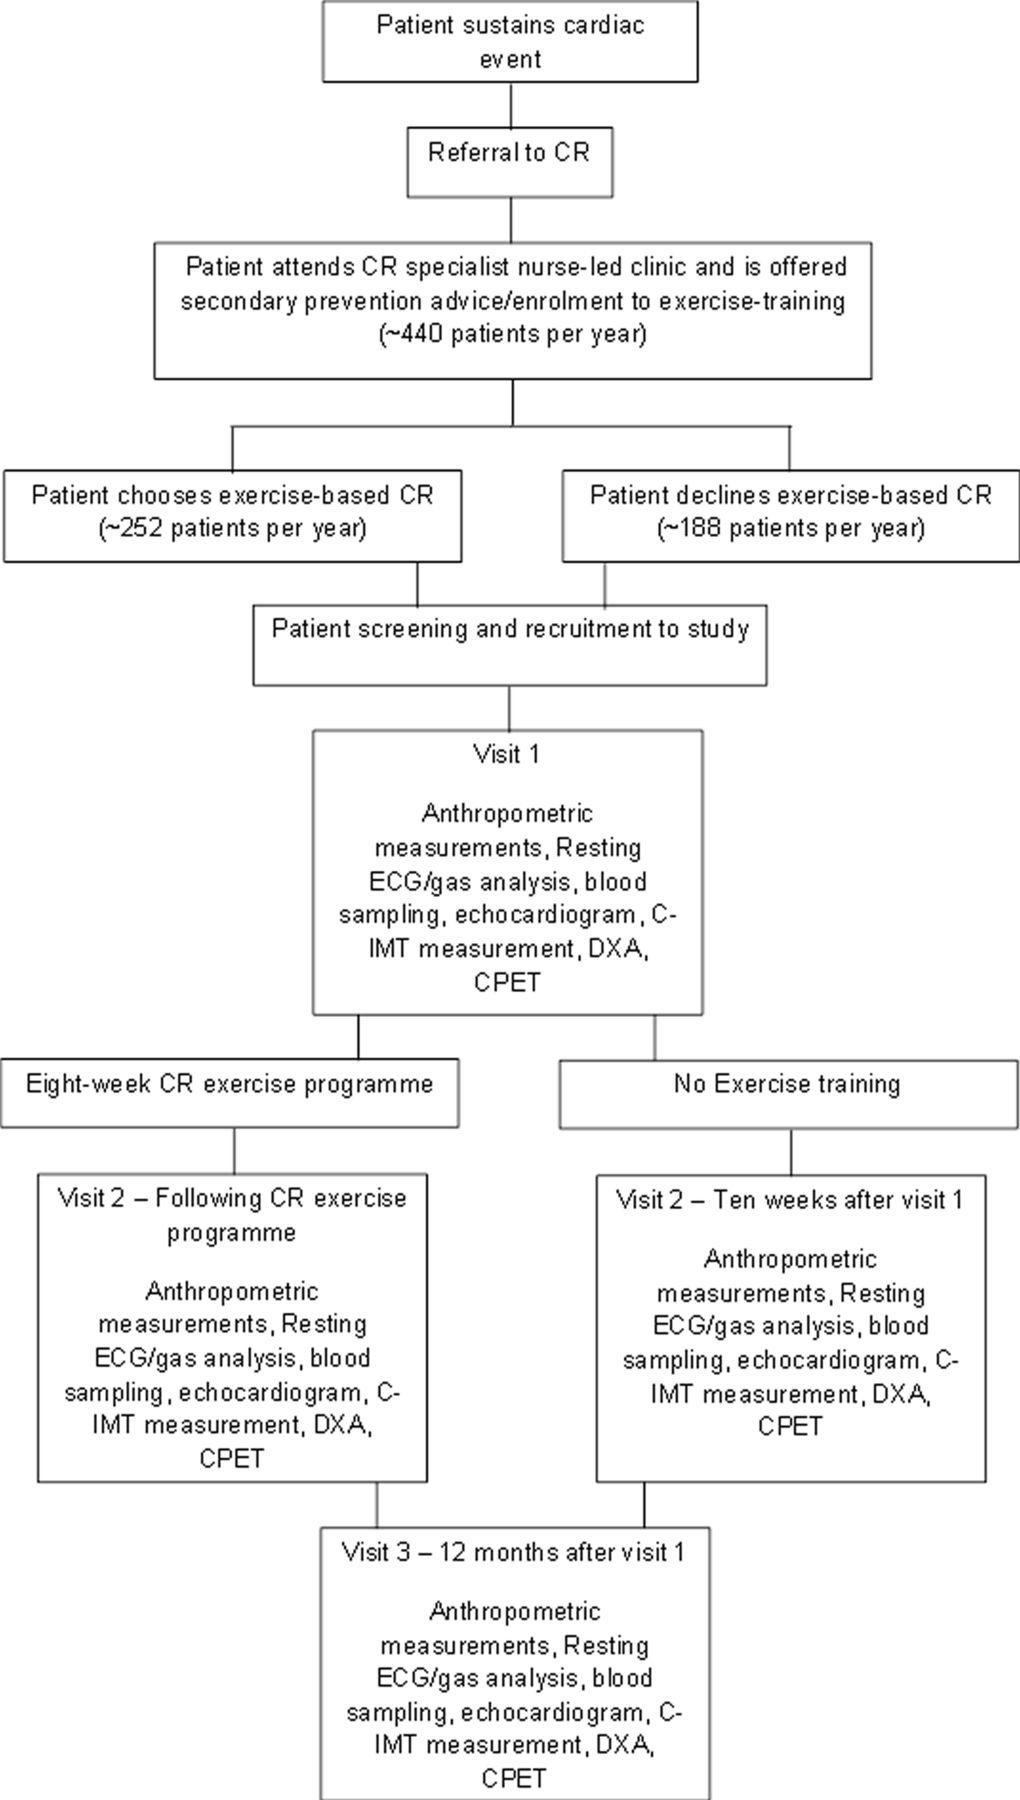 CARE CR-Cardiovascular and cardiorespiratory Adaptations to